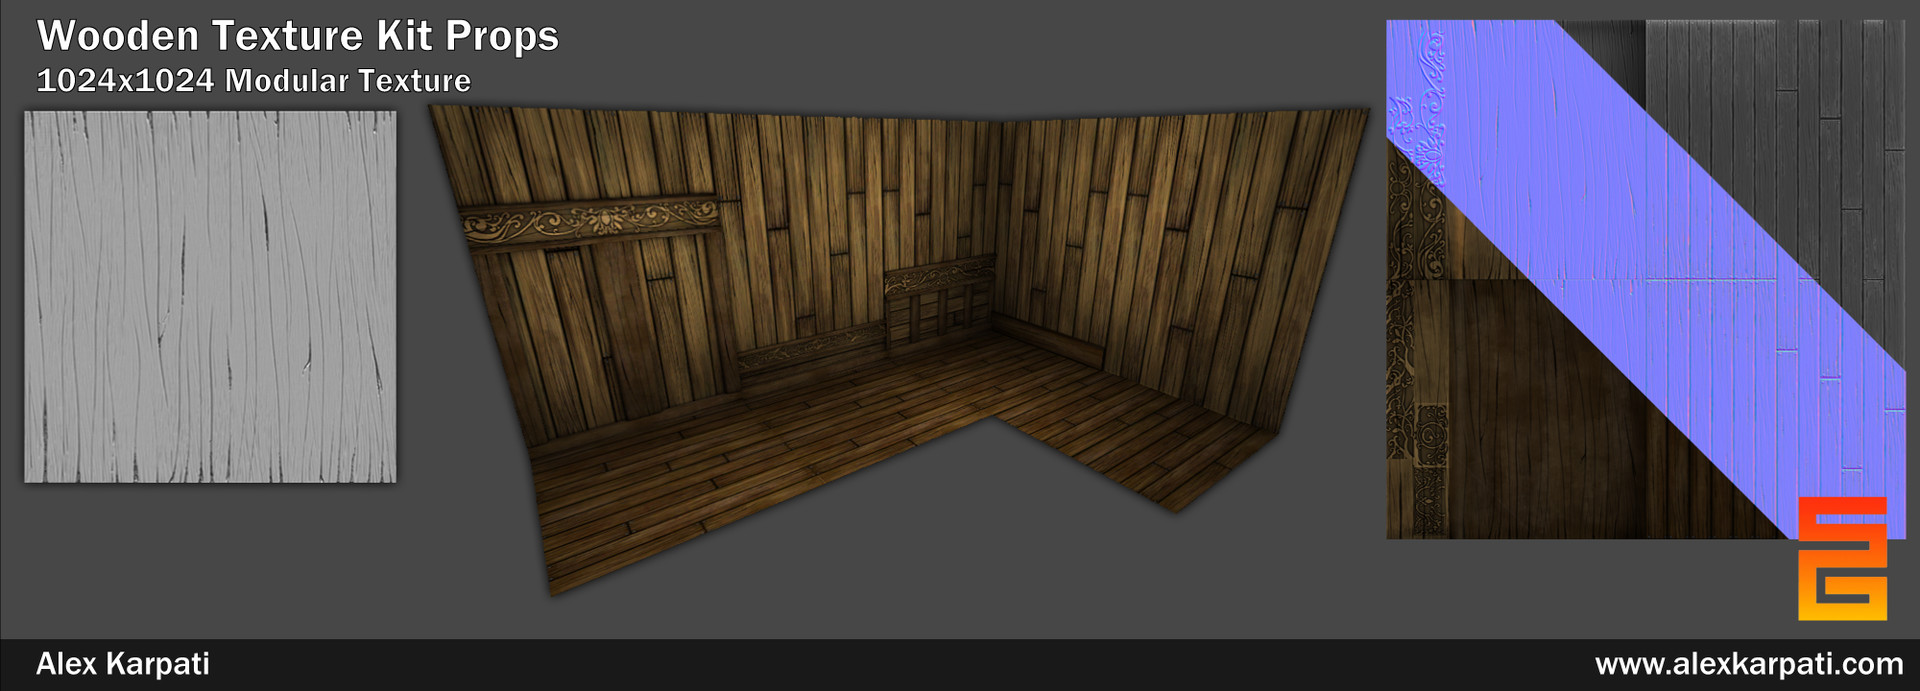 Alex karpati wooden kit v01